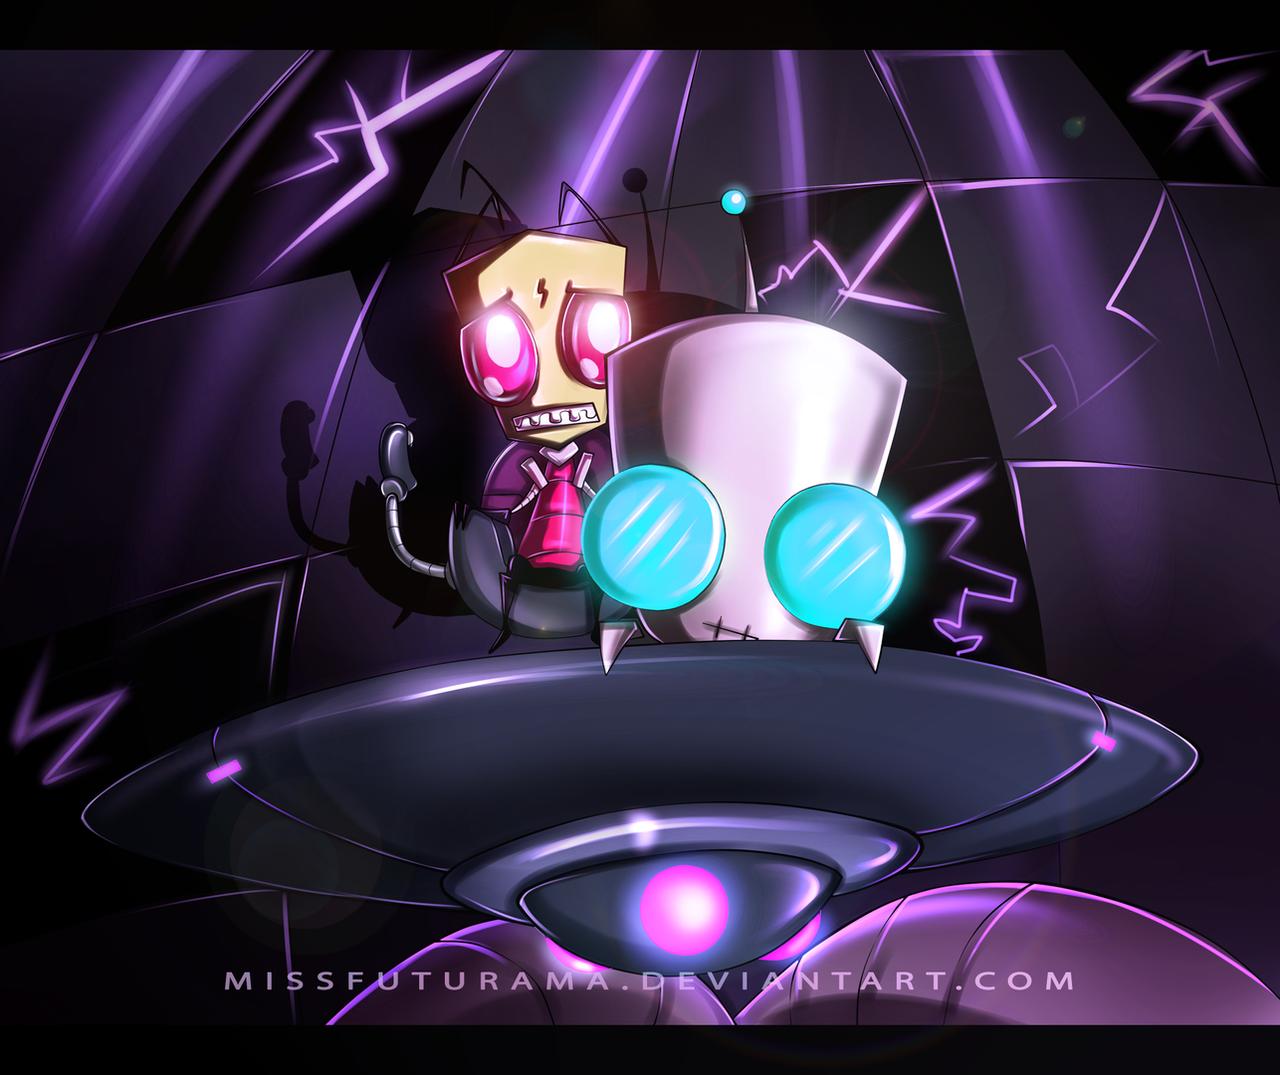 Zim's Problems by MissFuturama